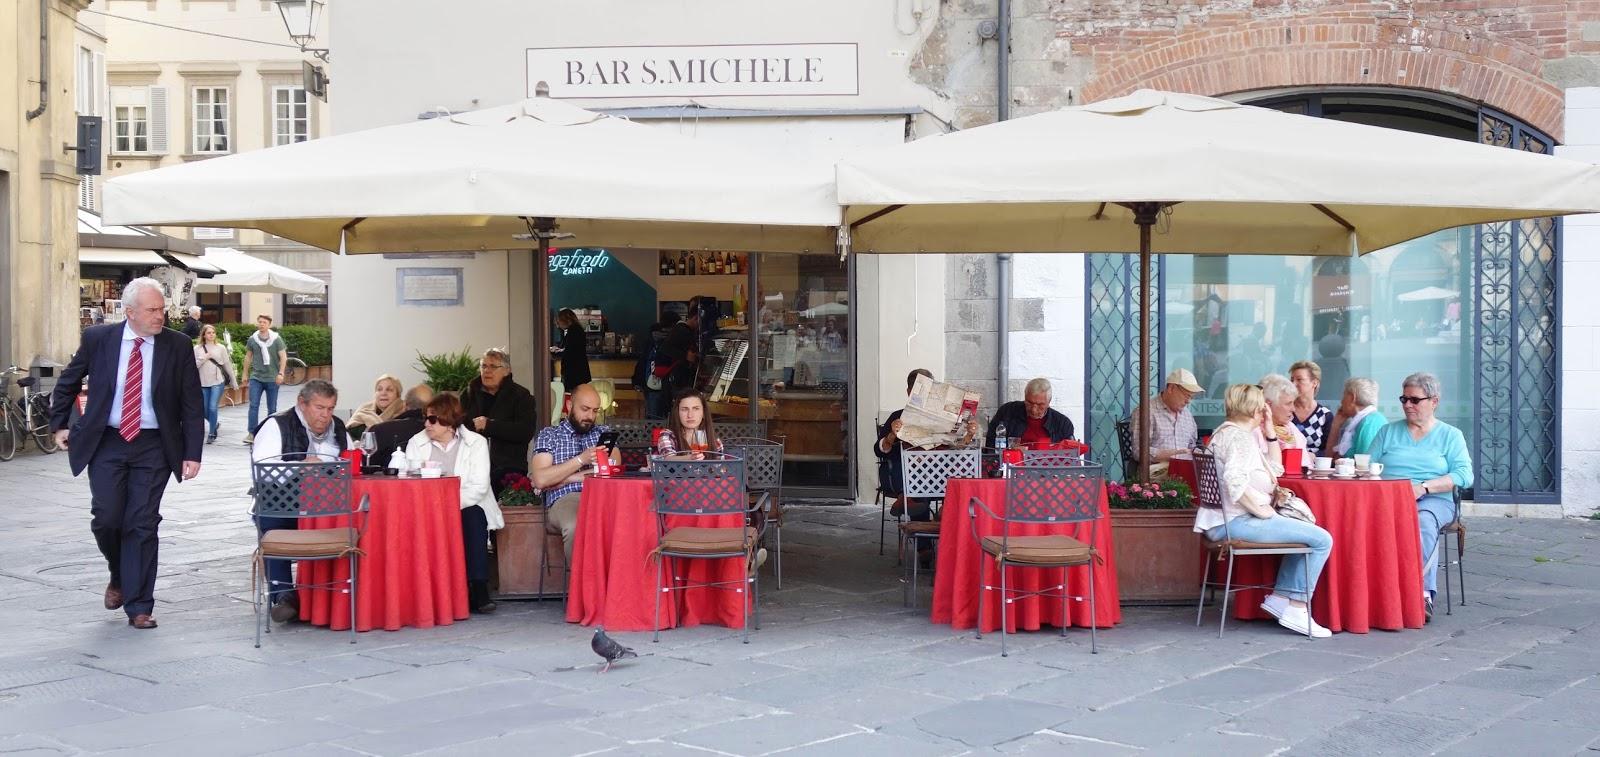 Tuscany Street Cafe Mural